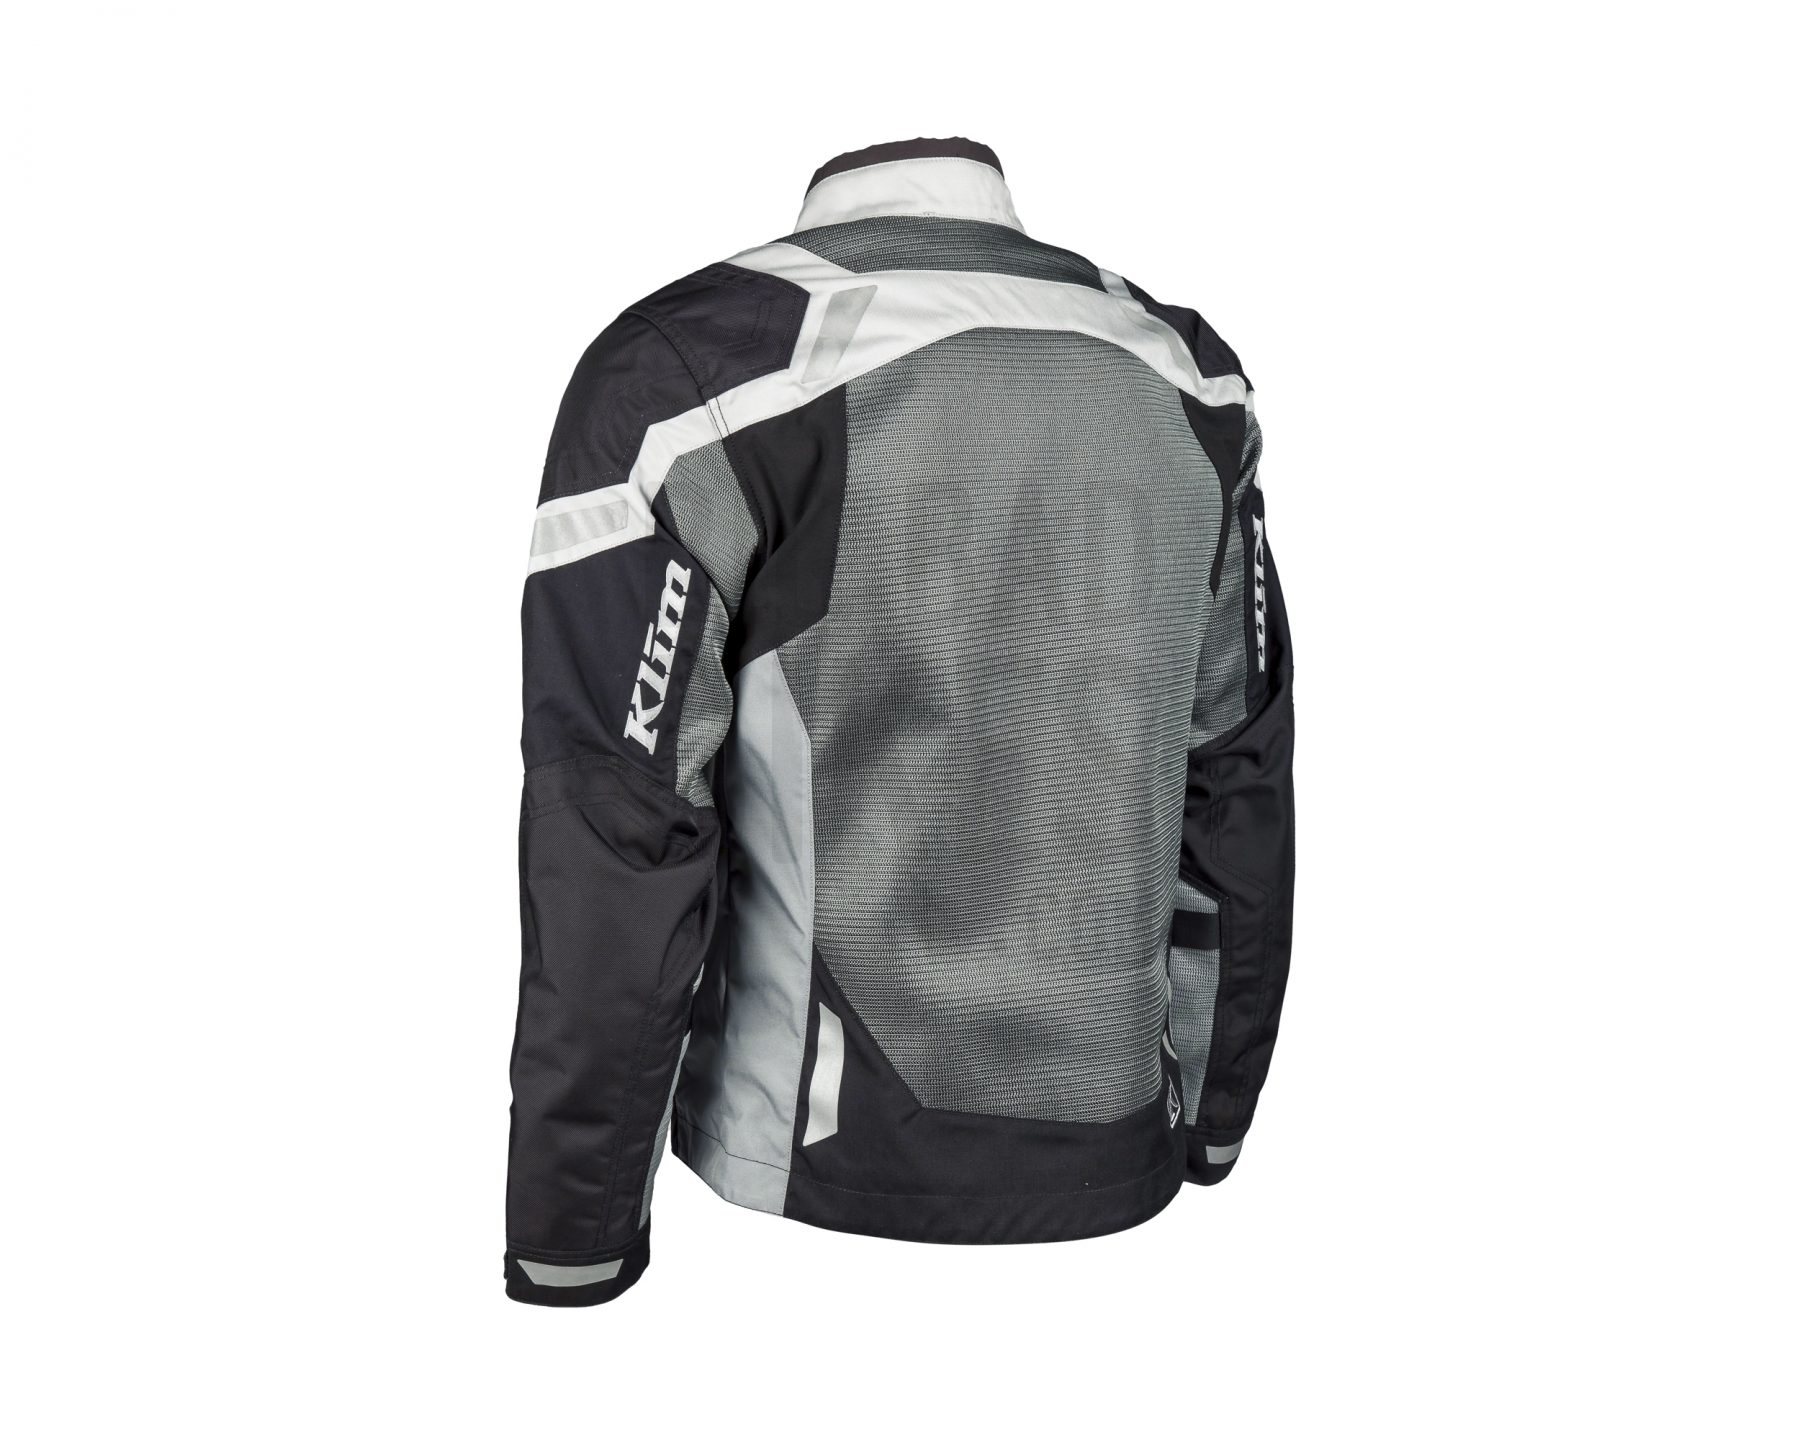 Induction Jacket_5060-002_Light Gray_05